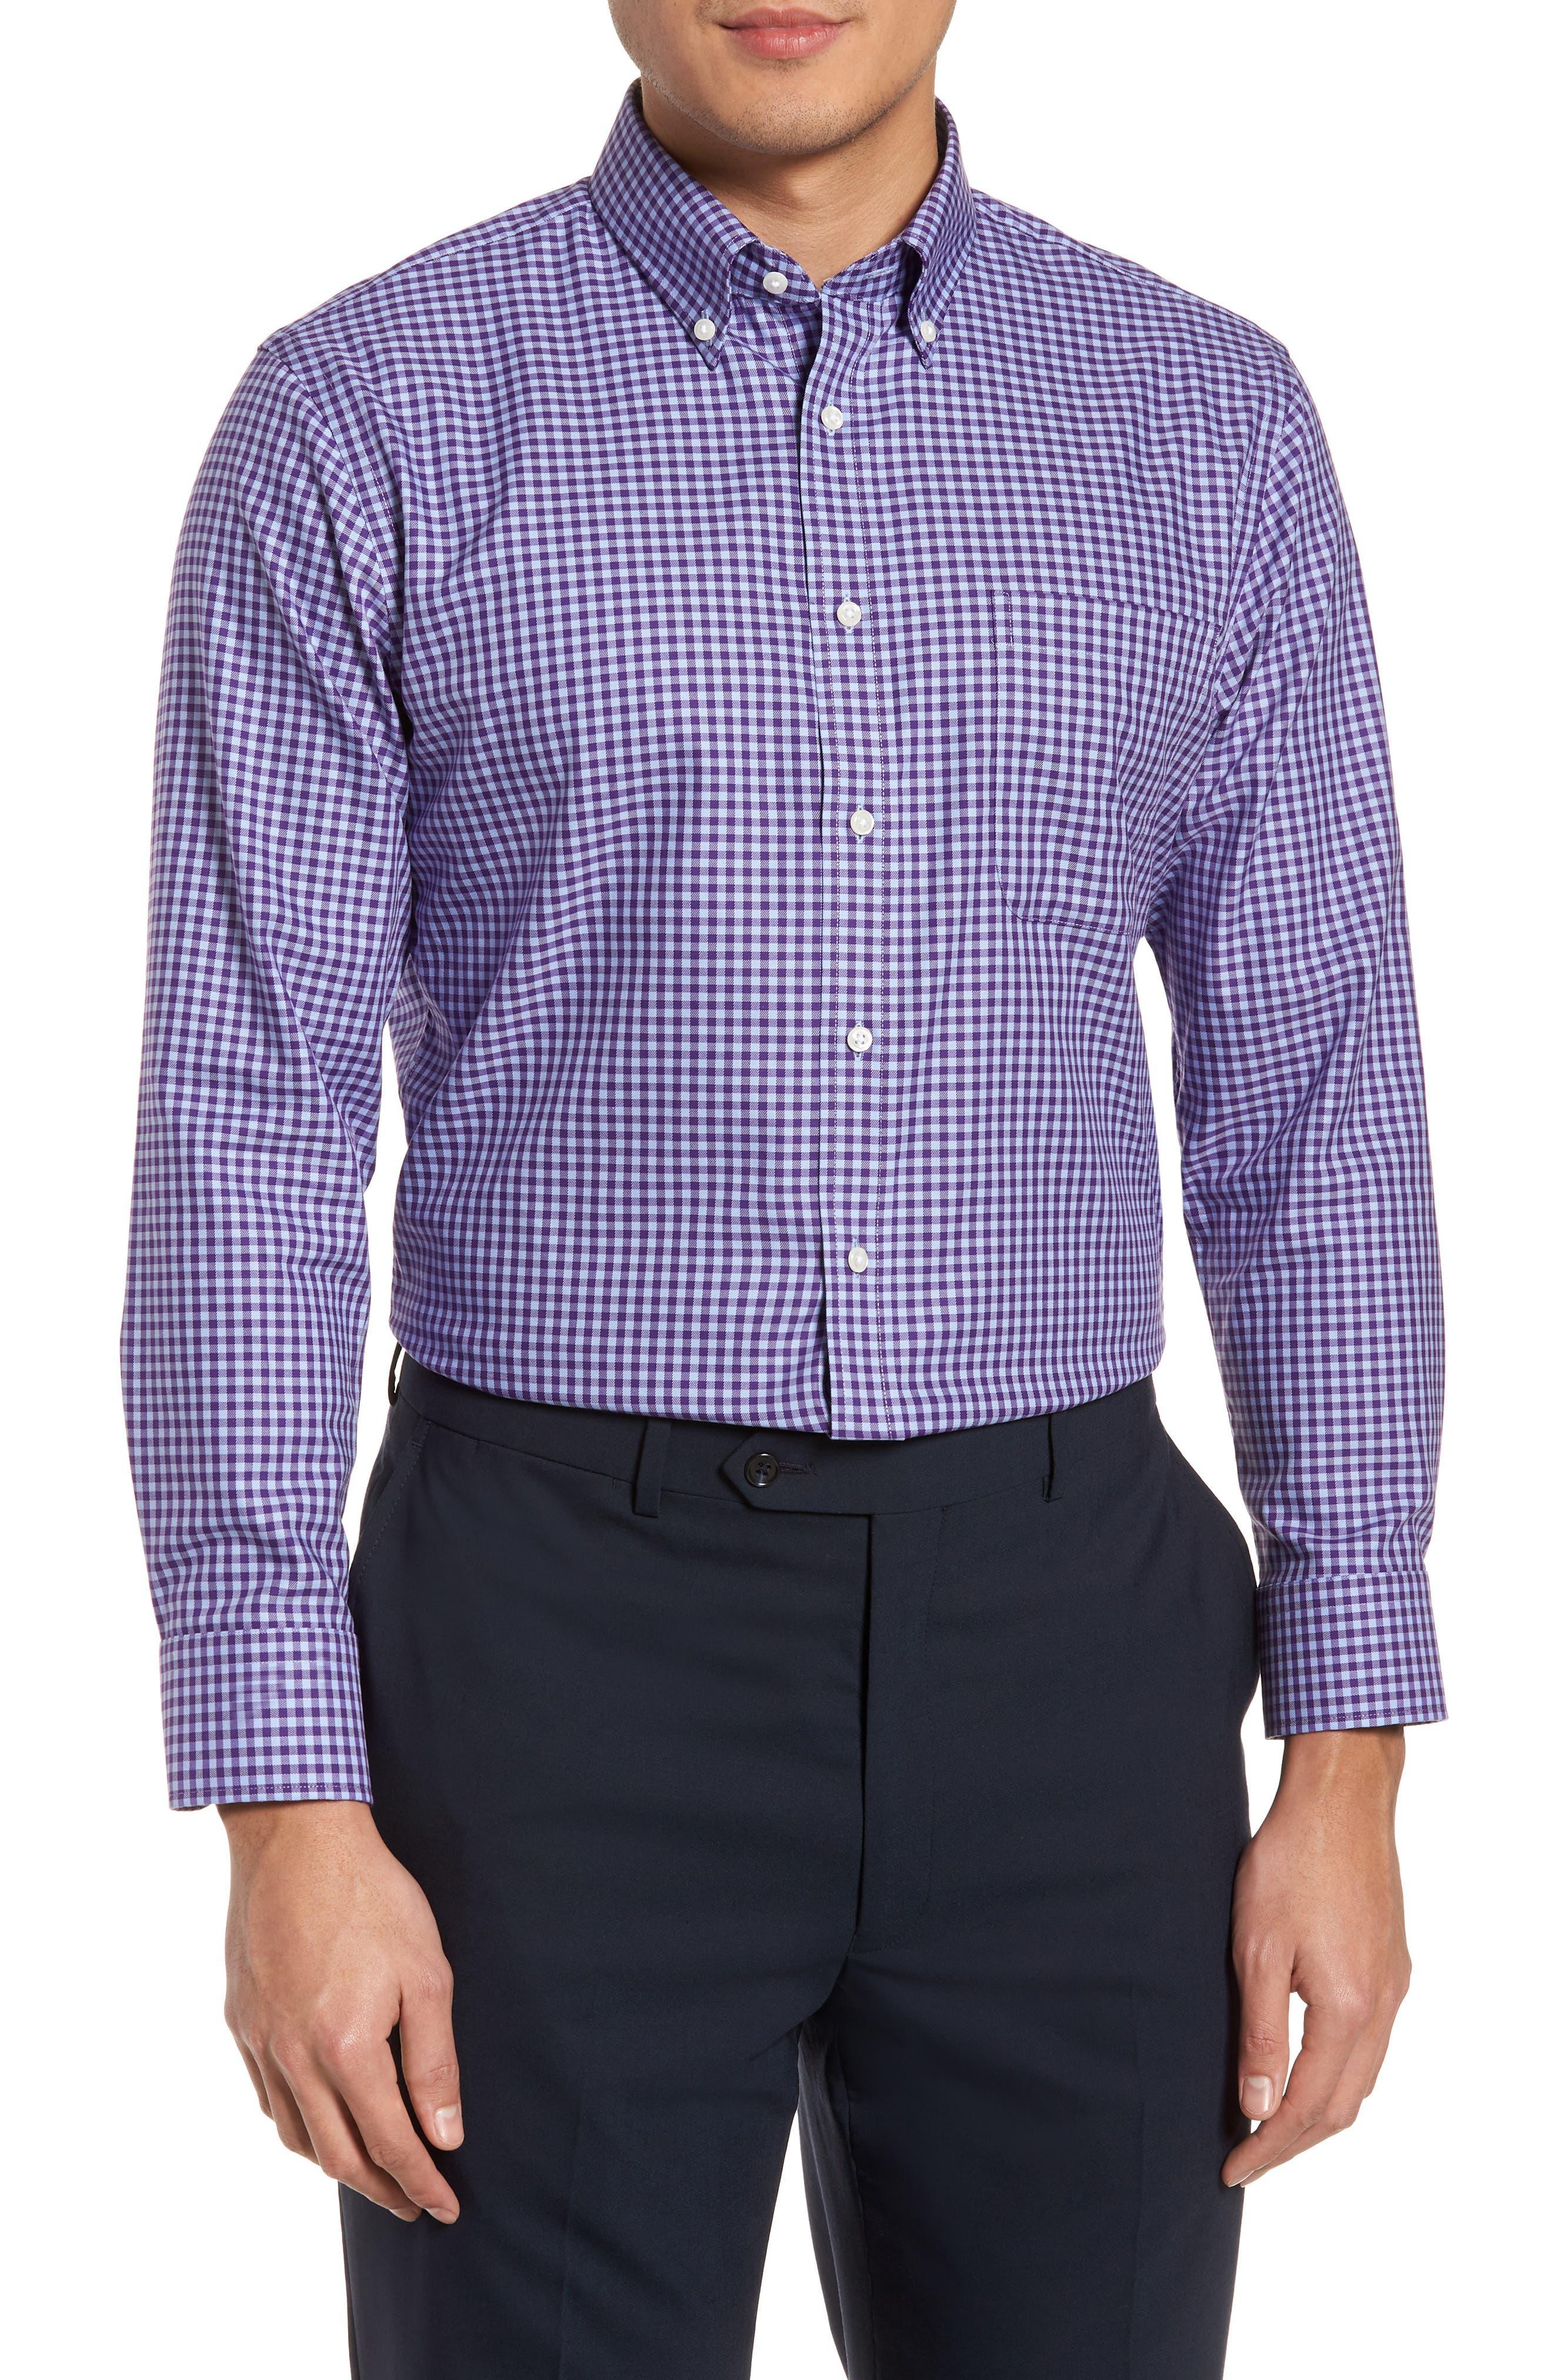 Alternate Image 1 Selected - Nordstrom Men's Shop Trim Fit Non-Iron Gingham Dress Shirt